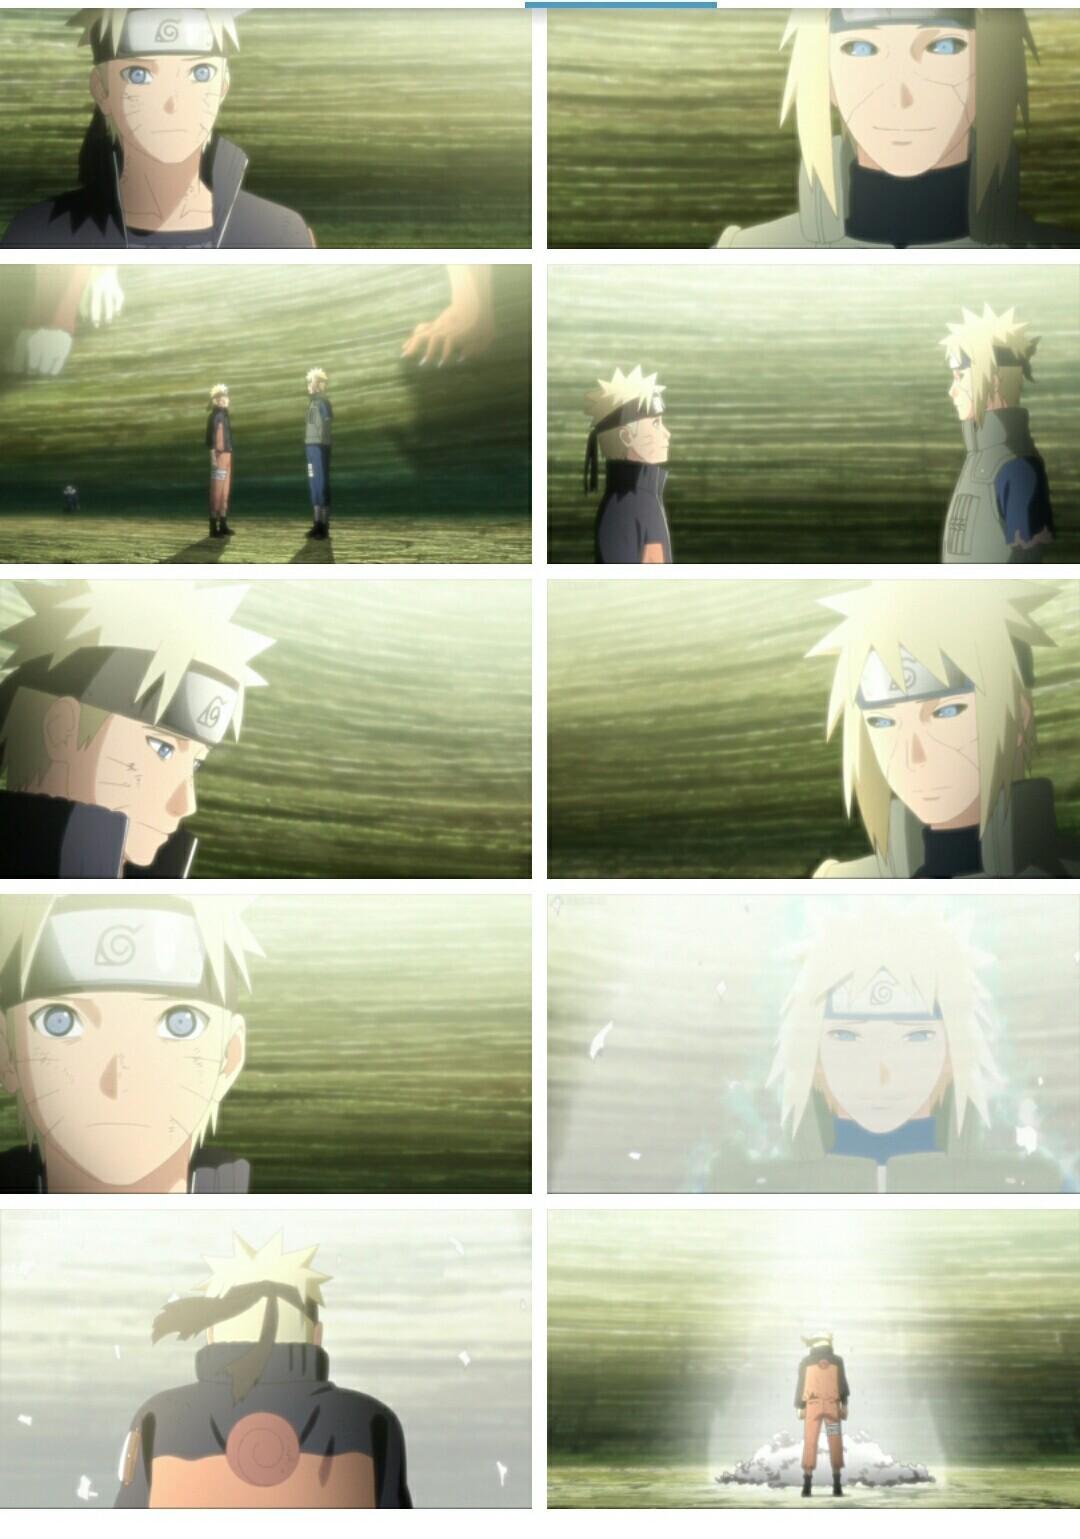 Naruto Shippuden Episode 474 English Dubbed - AnimesEpisodes